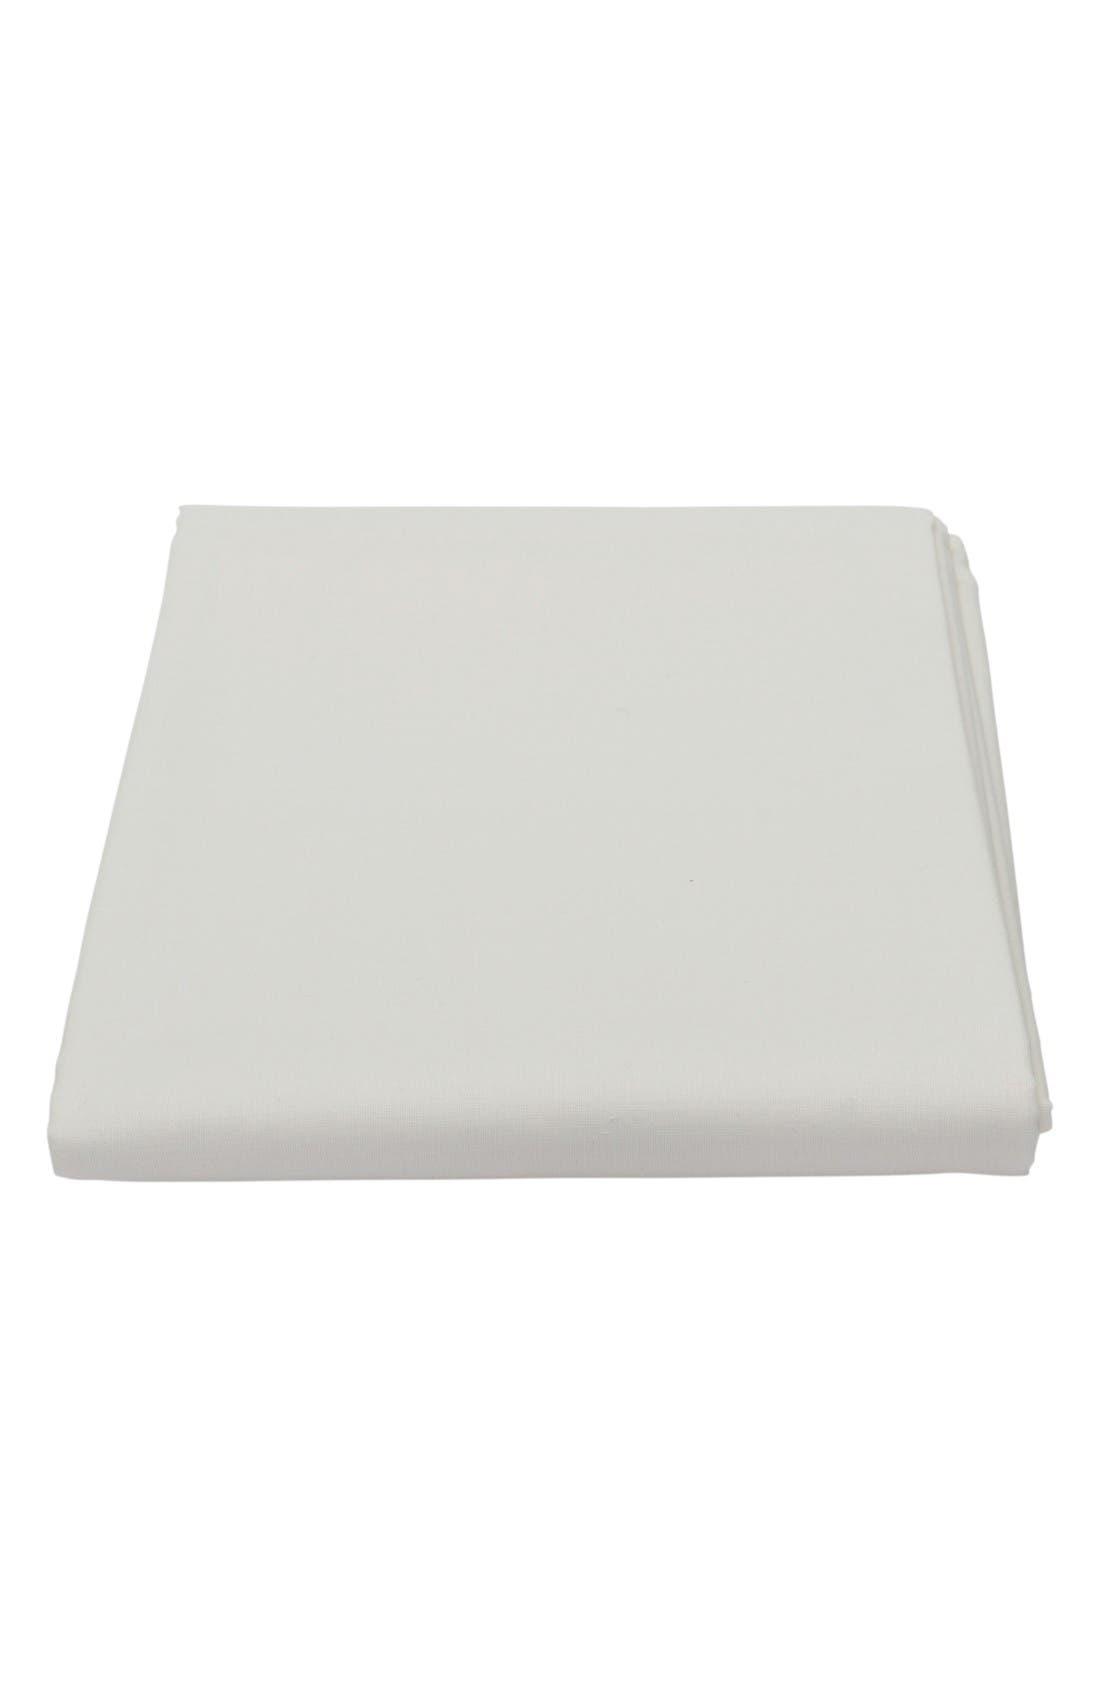 NUNA Organic Waterproof Mattress Cover/Fitted Sheet for SENA